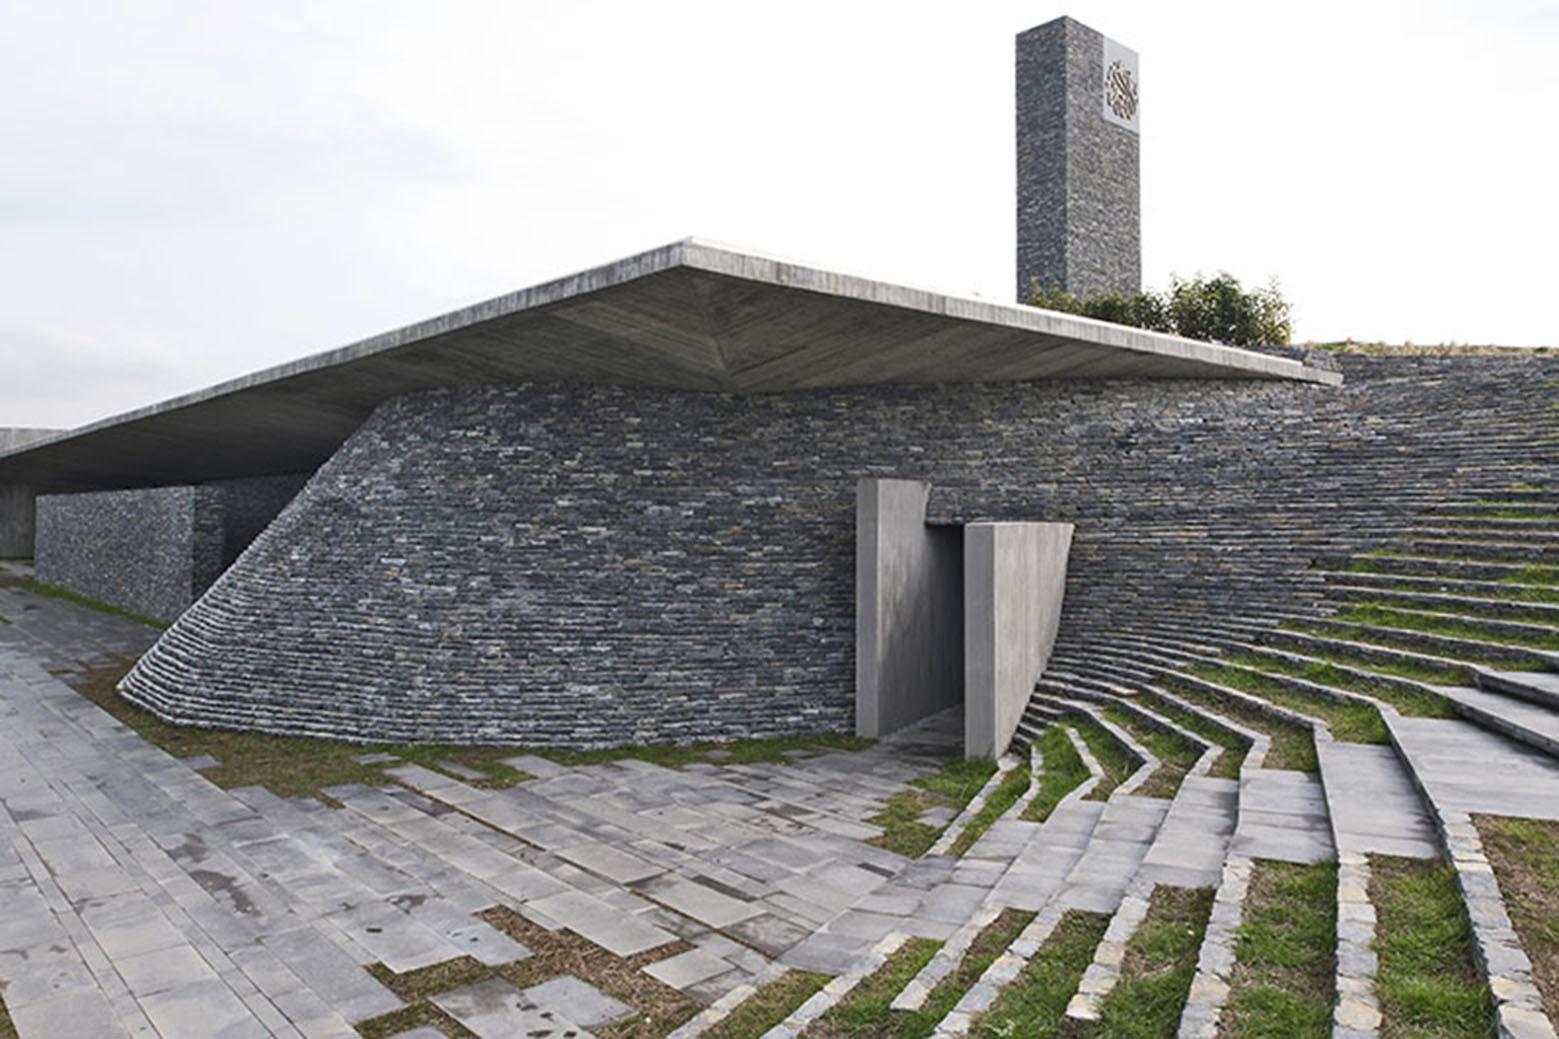 539a9d00c07a805cea000808_sancaklar-mosque-emre-arolat-architects_138am20140214d8543